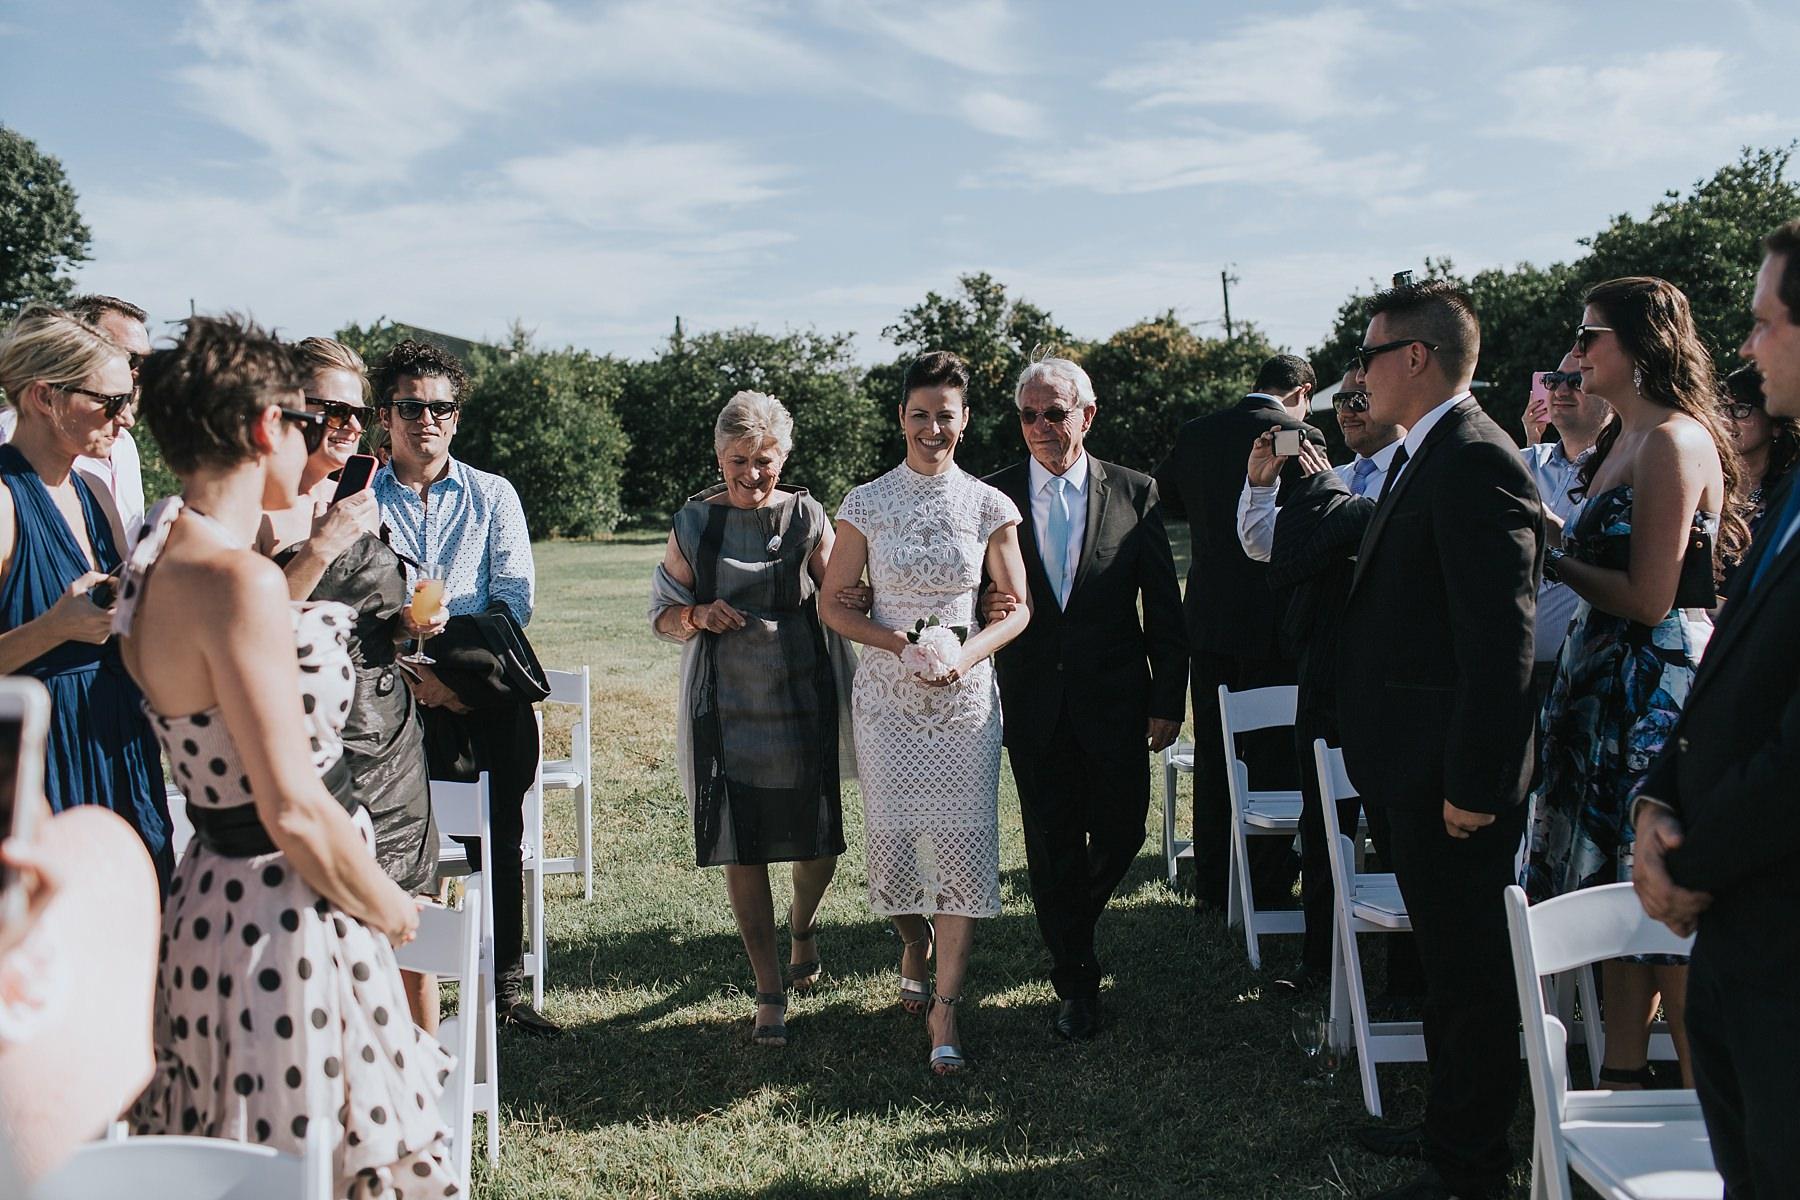 cornwallis house bride